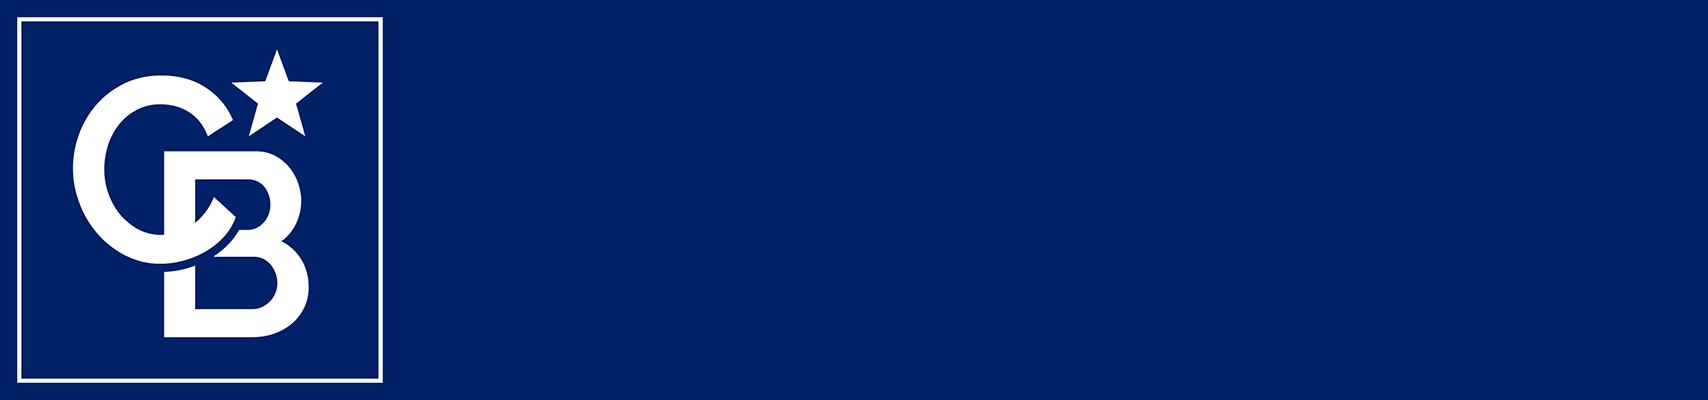 Gail Kenefick - Coldwell Banker Coastal Rivers Logo